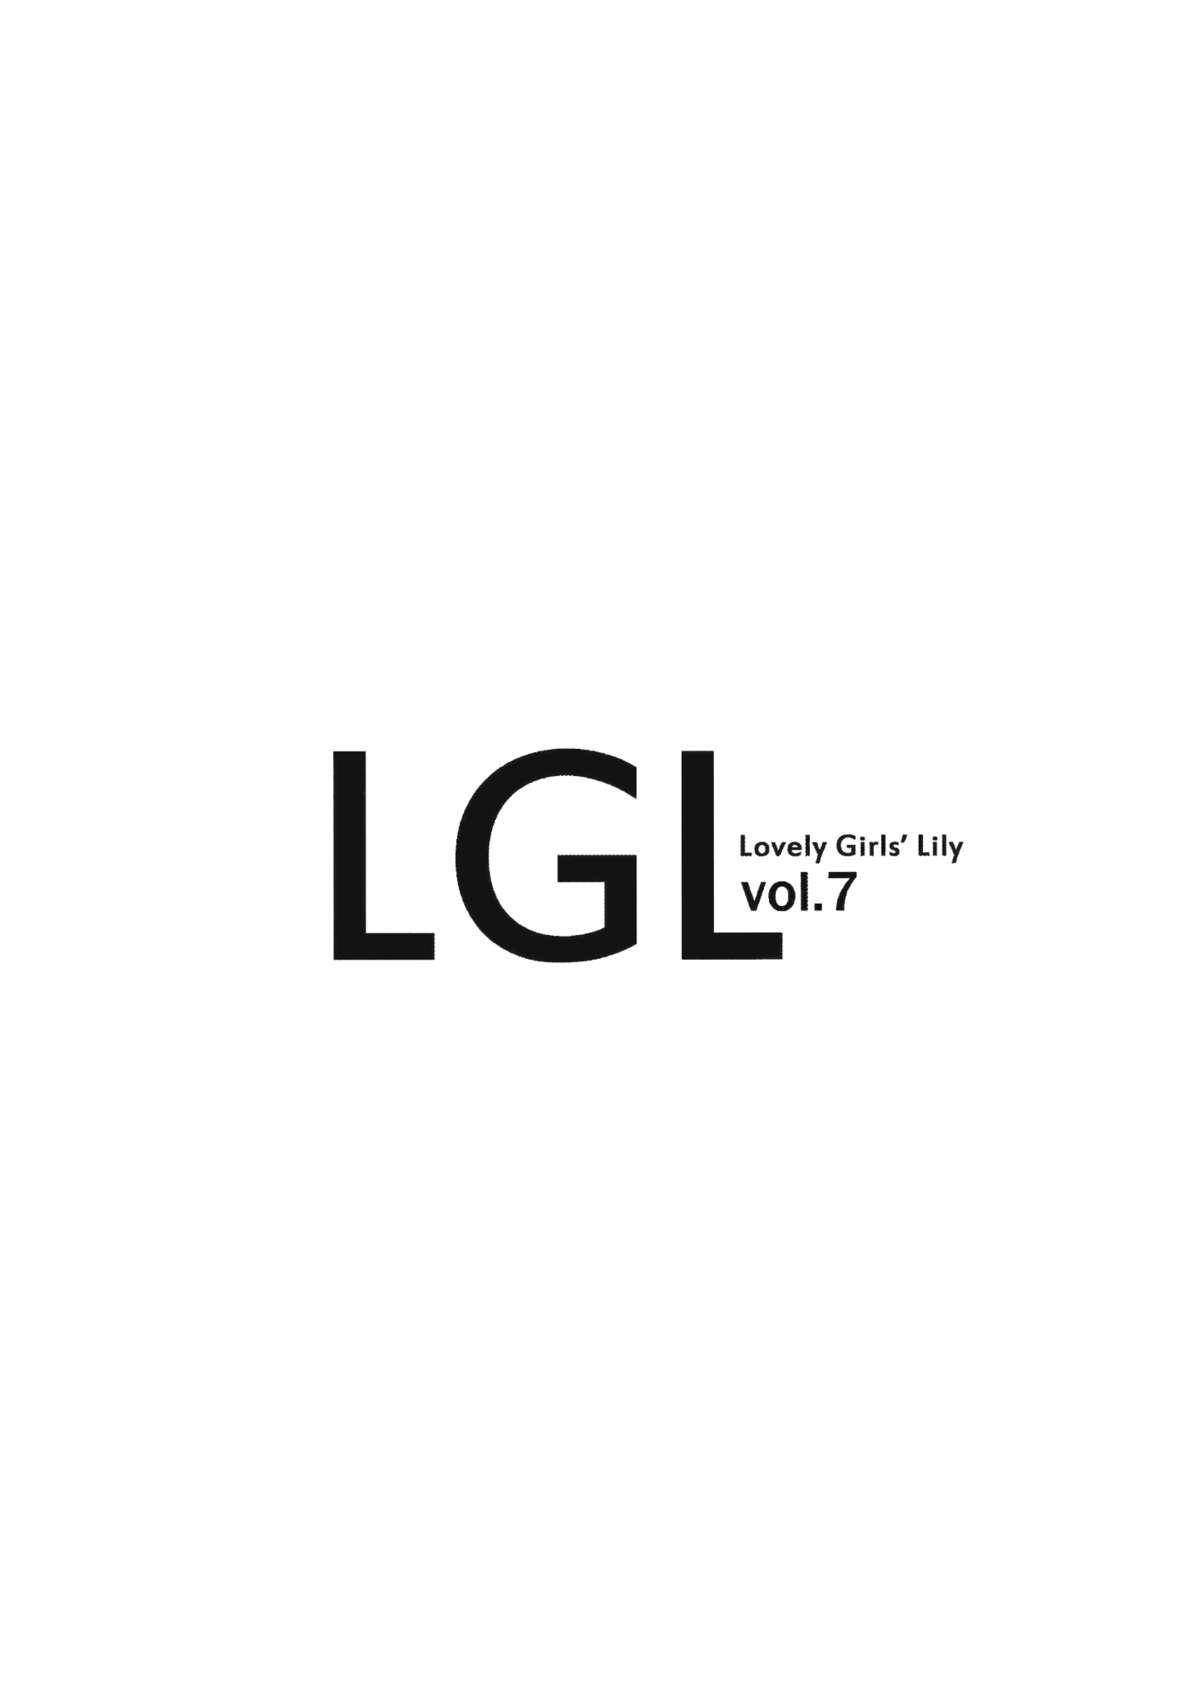 Lovely Girls' Lily Vol. 7 2